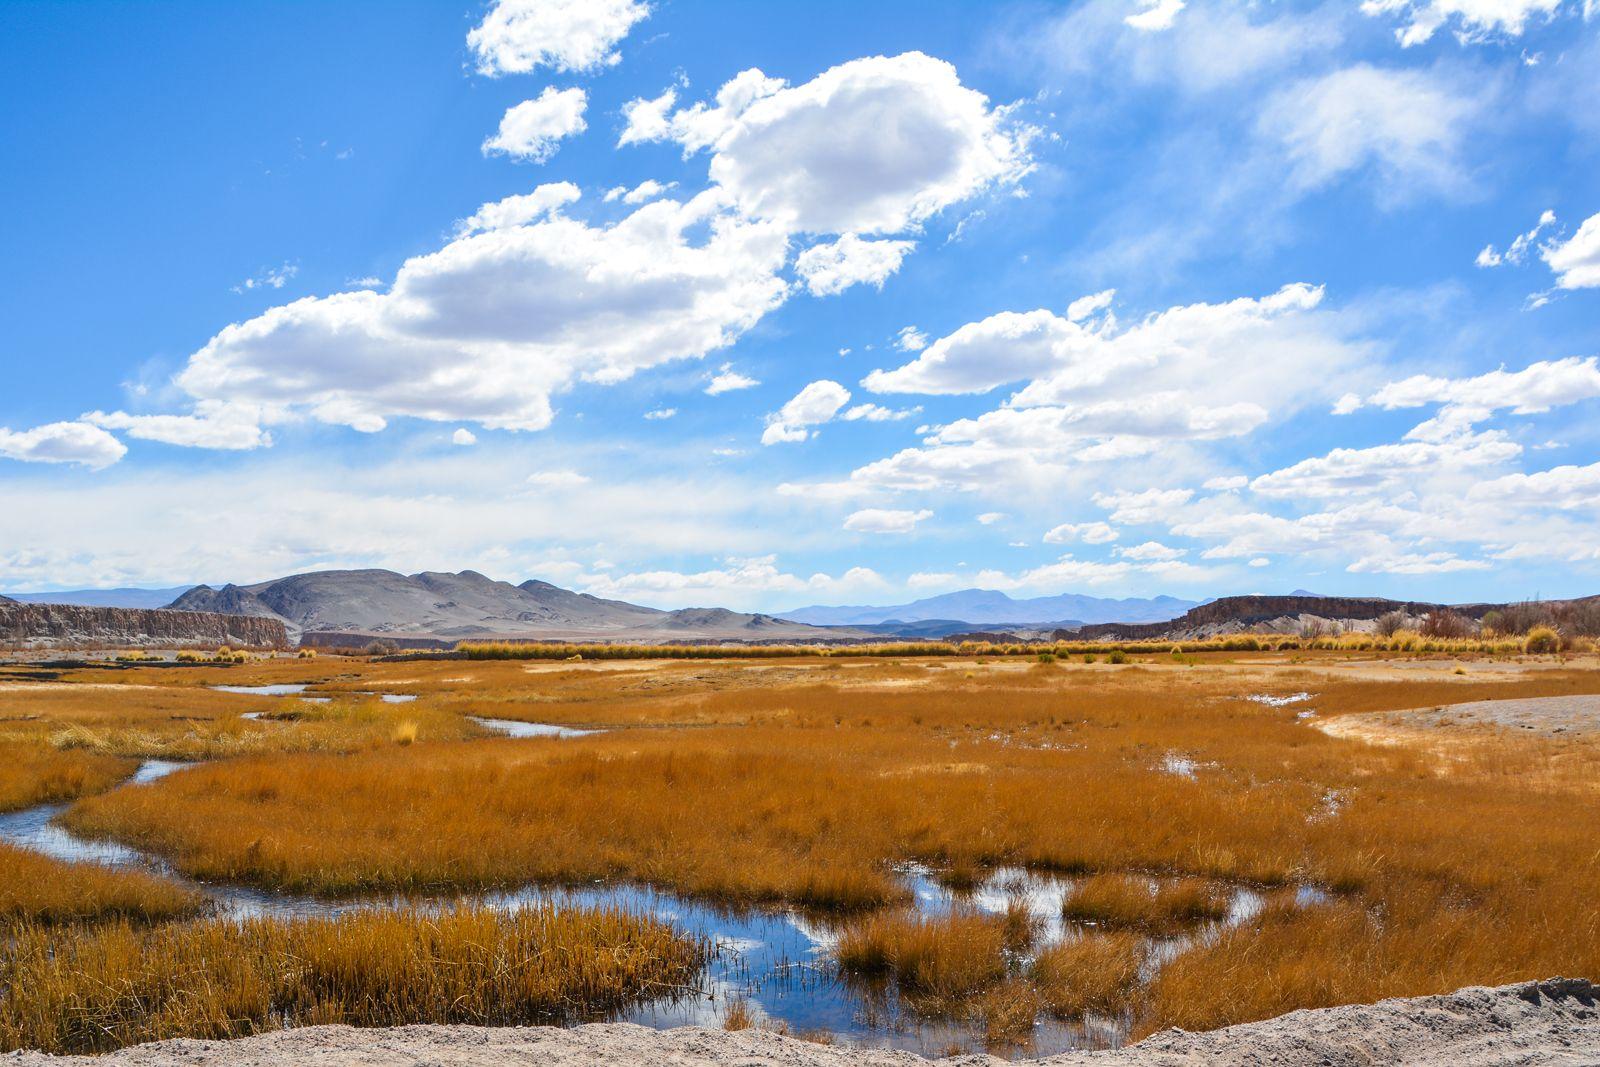 Antofagasta de la Sierra Catamarca Belen Argentine lagune et ciel bleu-postshow